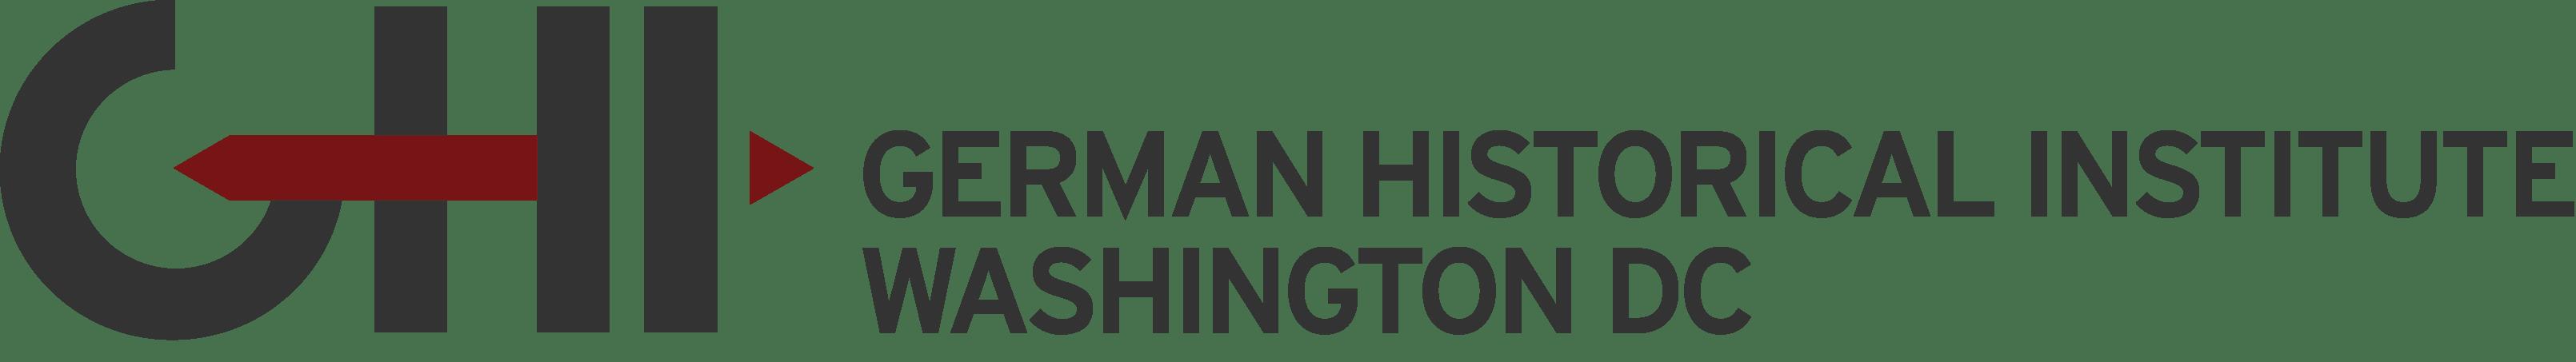 German Historical Institute Washington DC